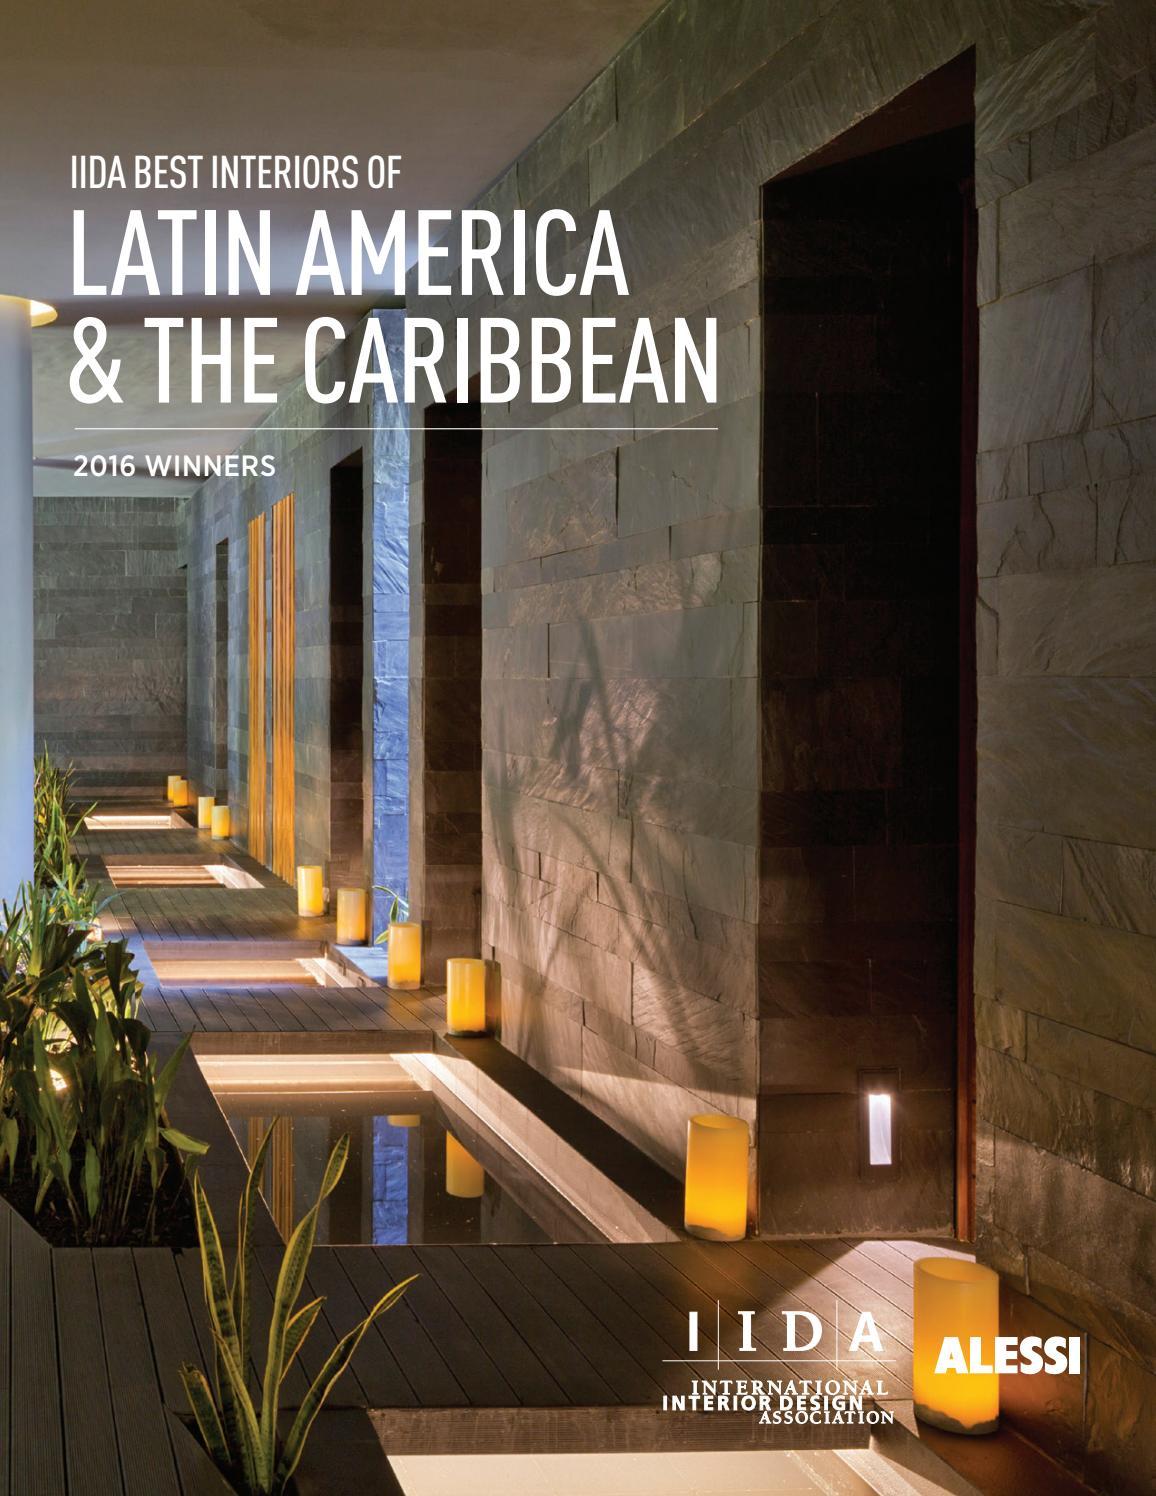 2016 Best Interiors Of Latin America The Caribbean Winners By IIDA HQ